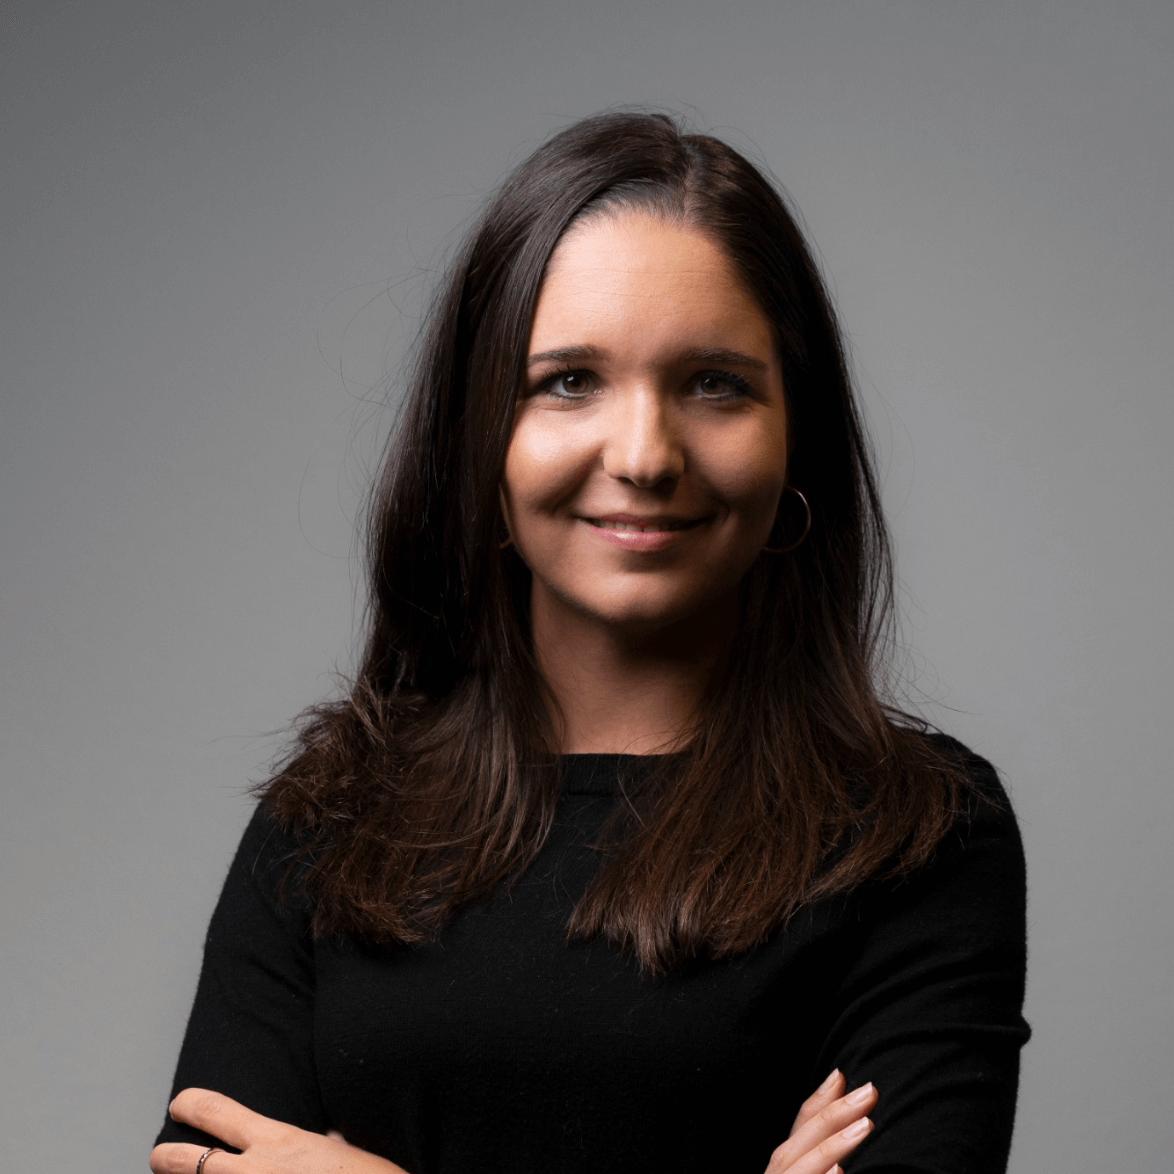 Stephanie Amstad